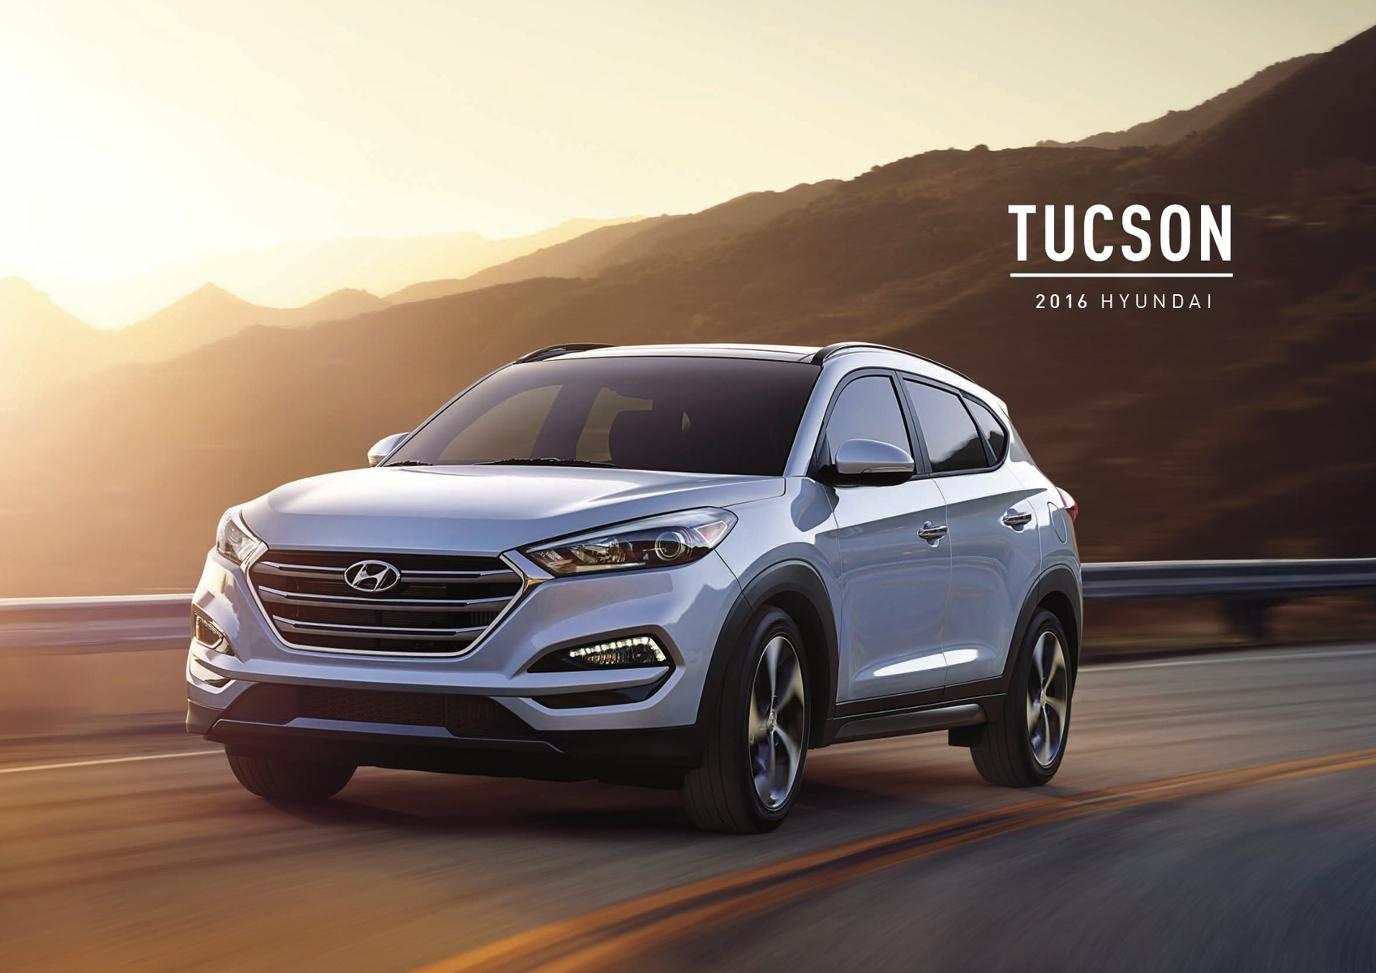 2016 Hyundai Tucson Brochure